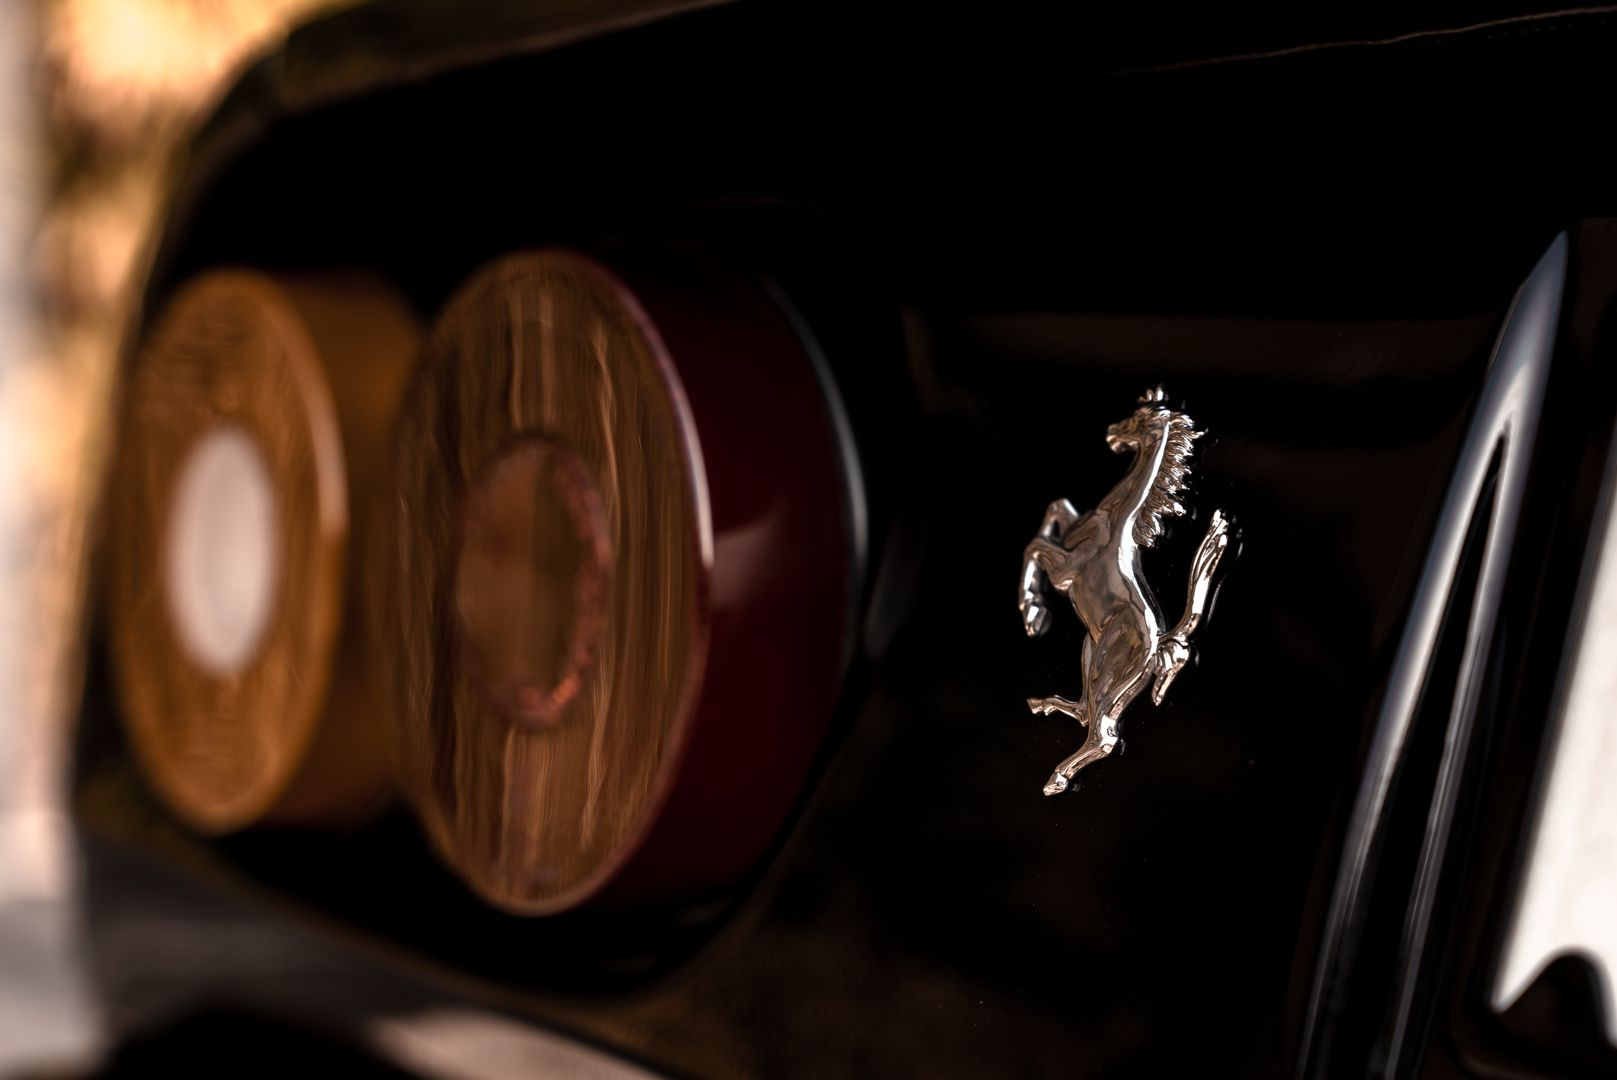 1980 Ferrari 208 GTB Carburatori 81283